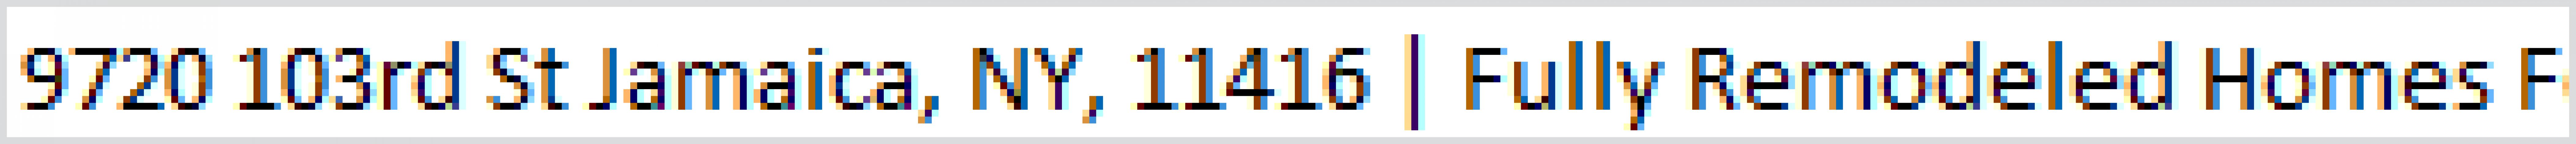 103rd St 9720,Jamaica,New York 11416,Sold,9720 ,1152